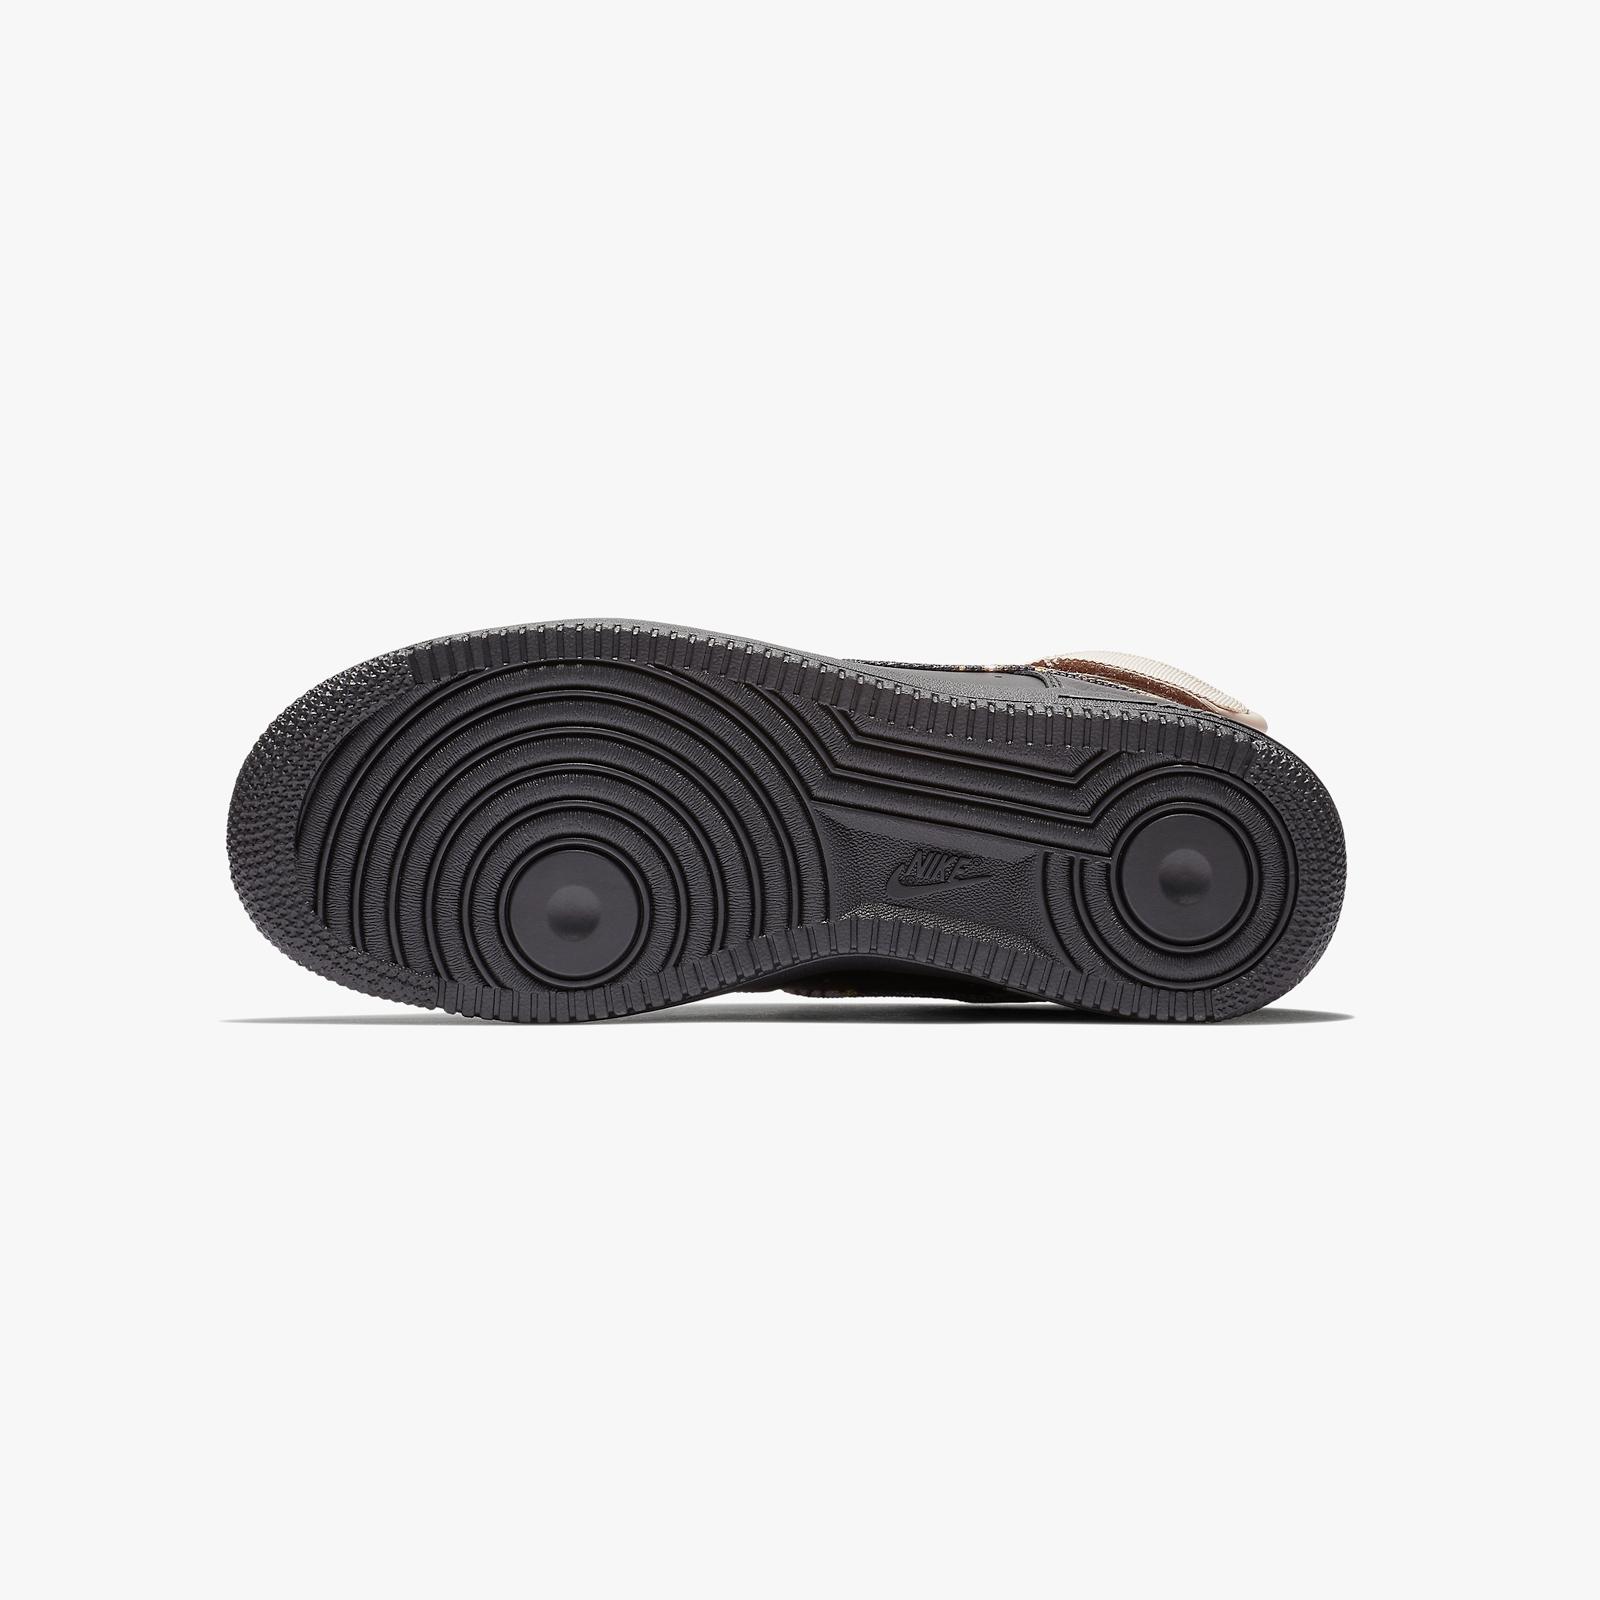 innovative design a6fd4 bb812 ... Nike Sportswear Air Force 1 High Print ...